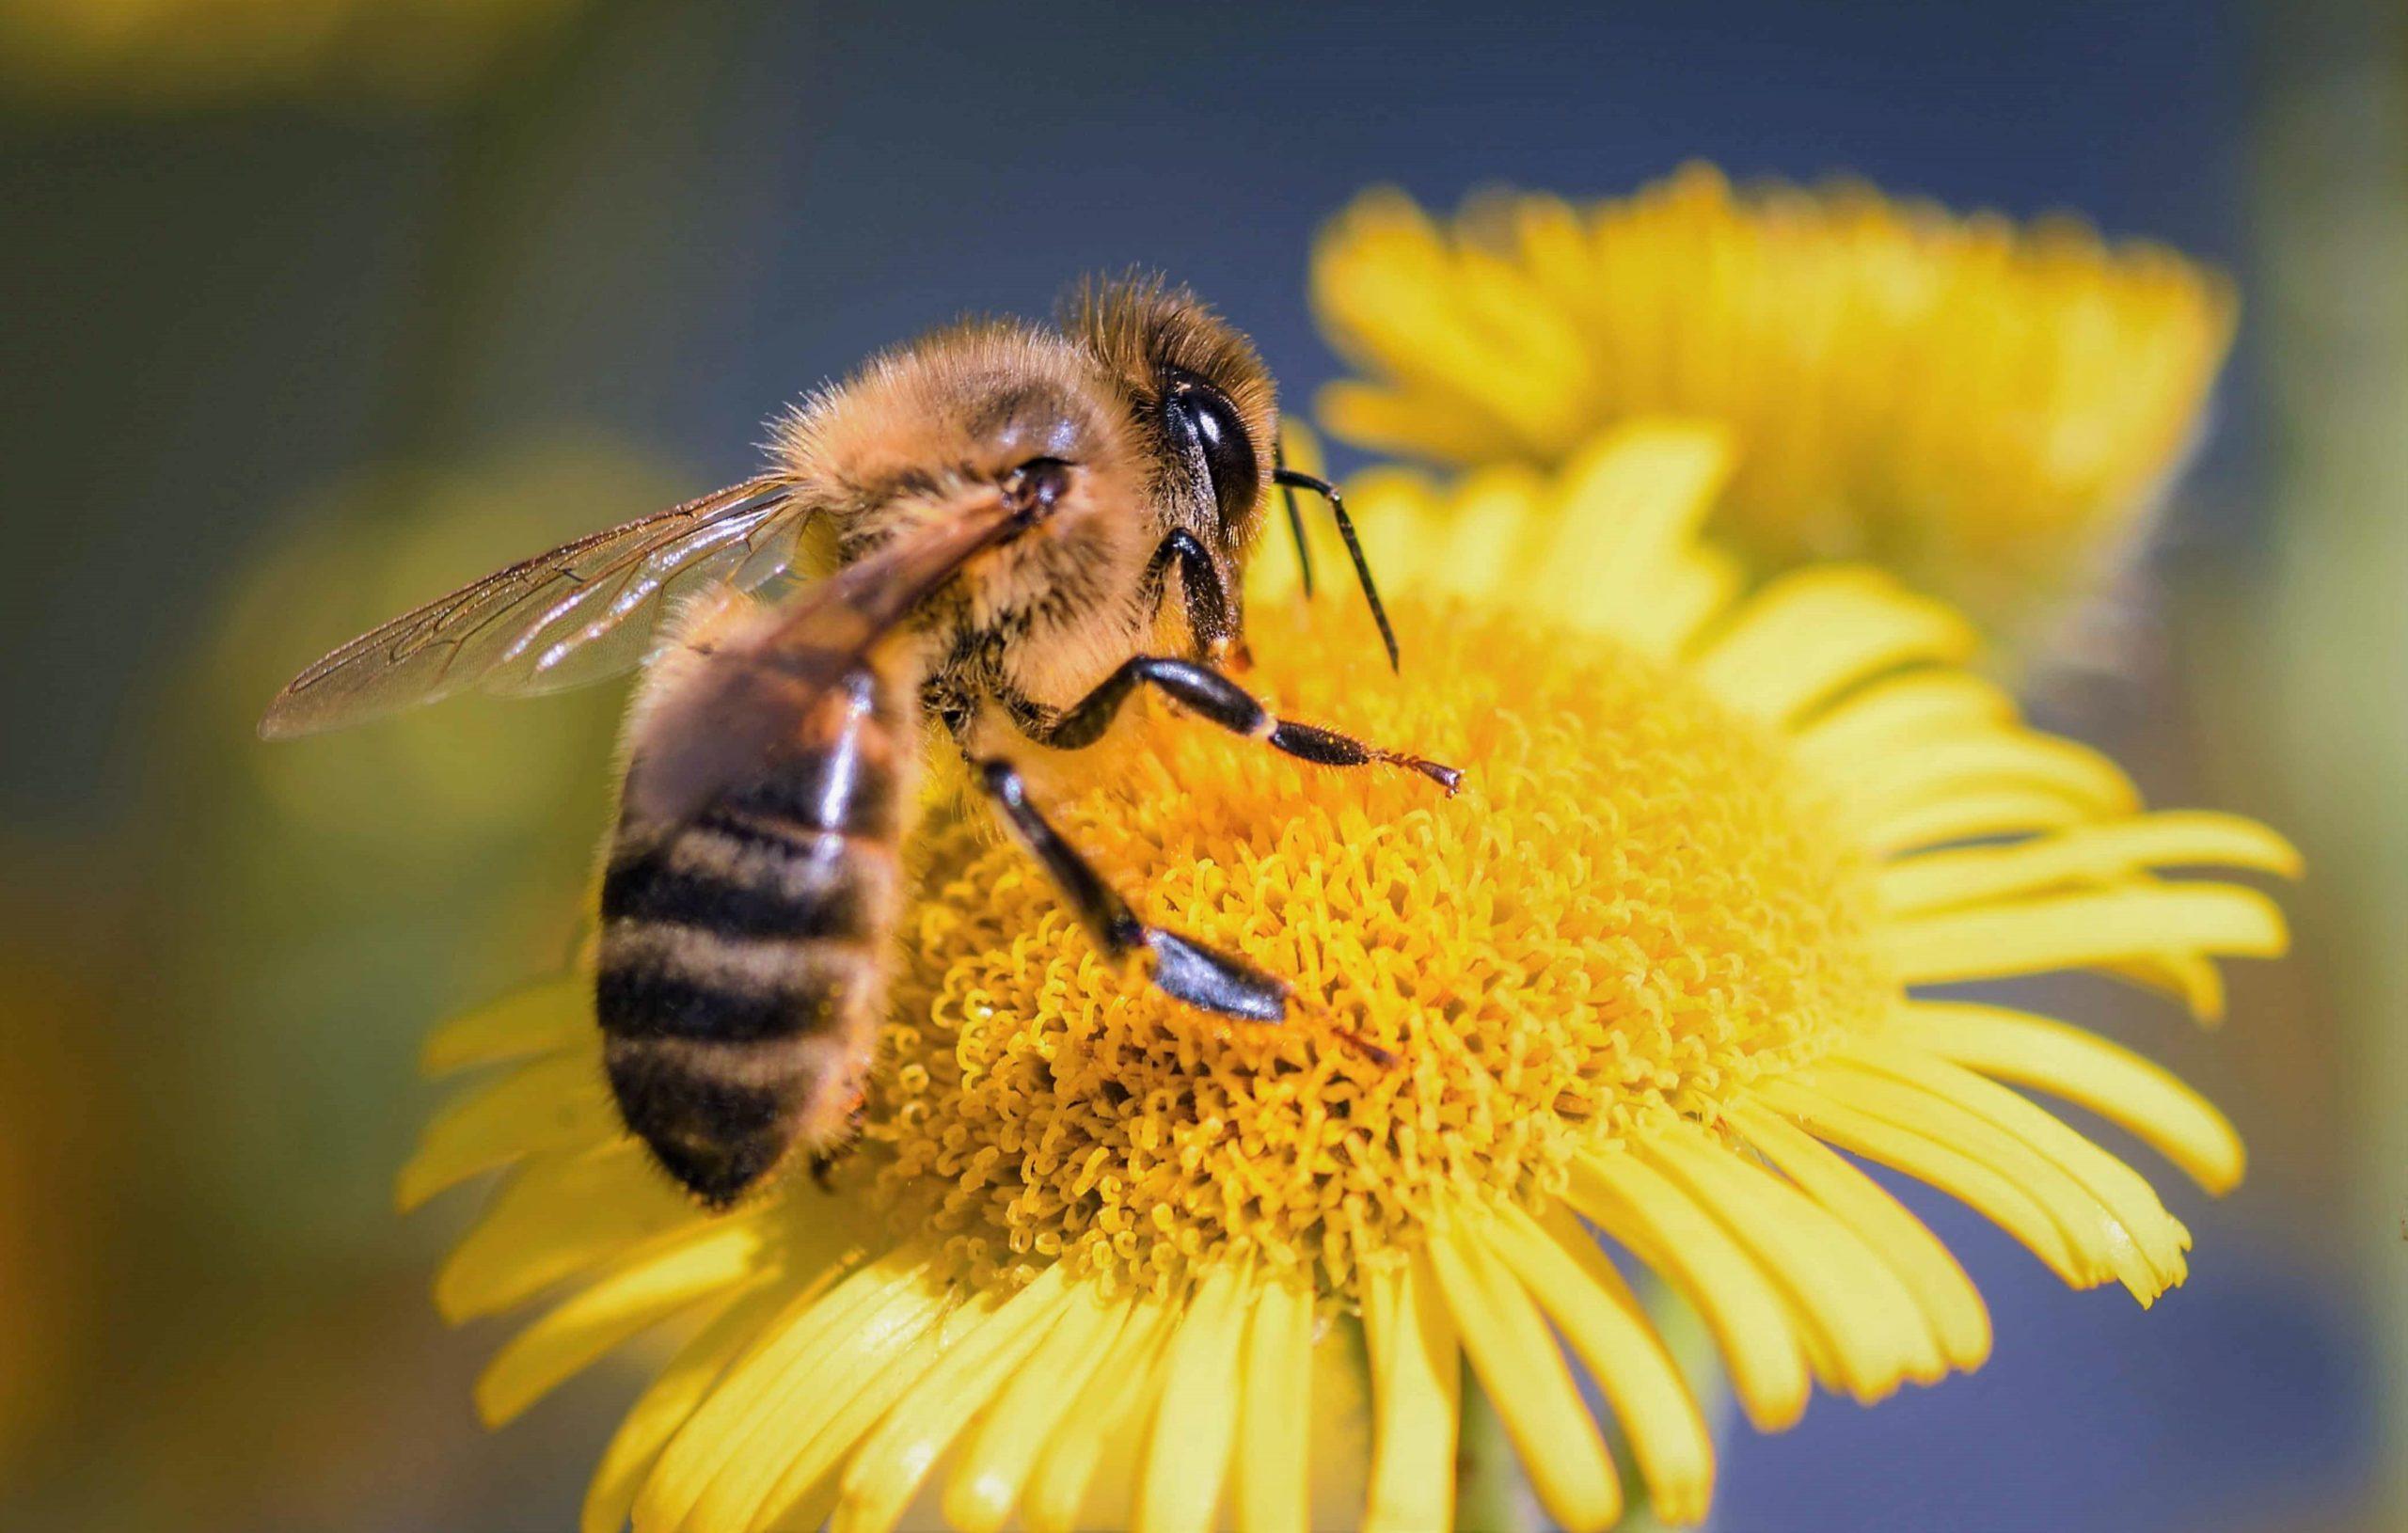 Сколько у пчелы глаз?